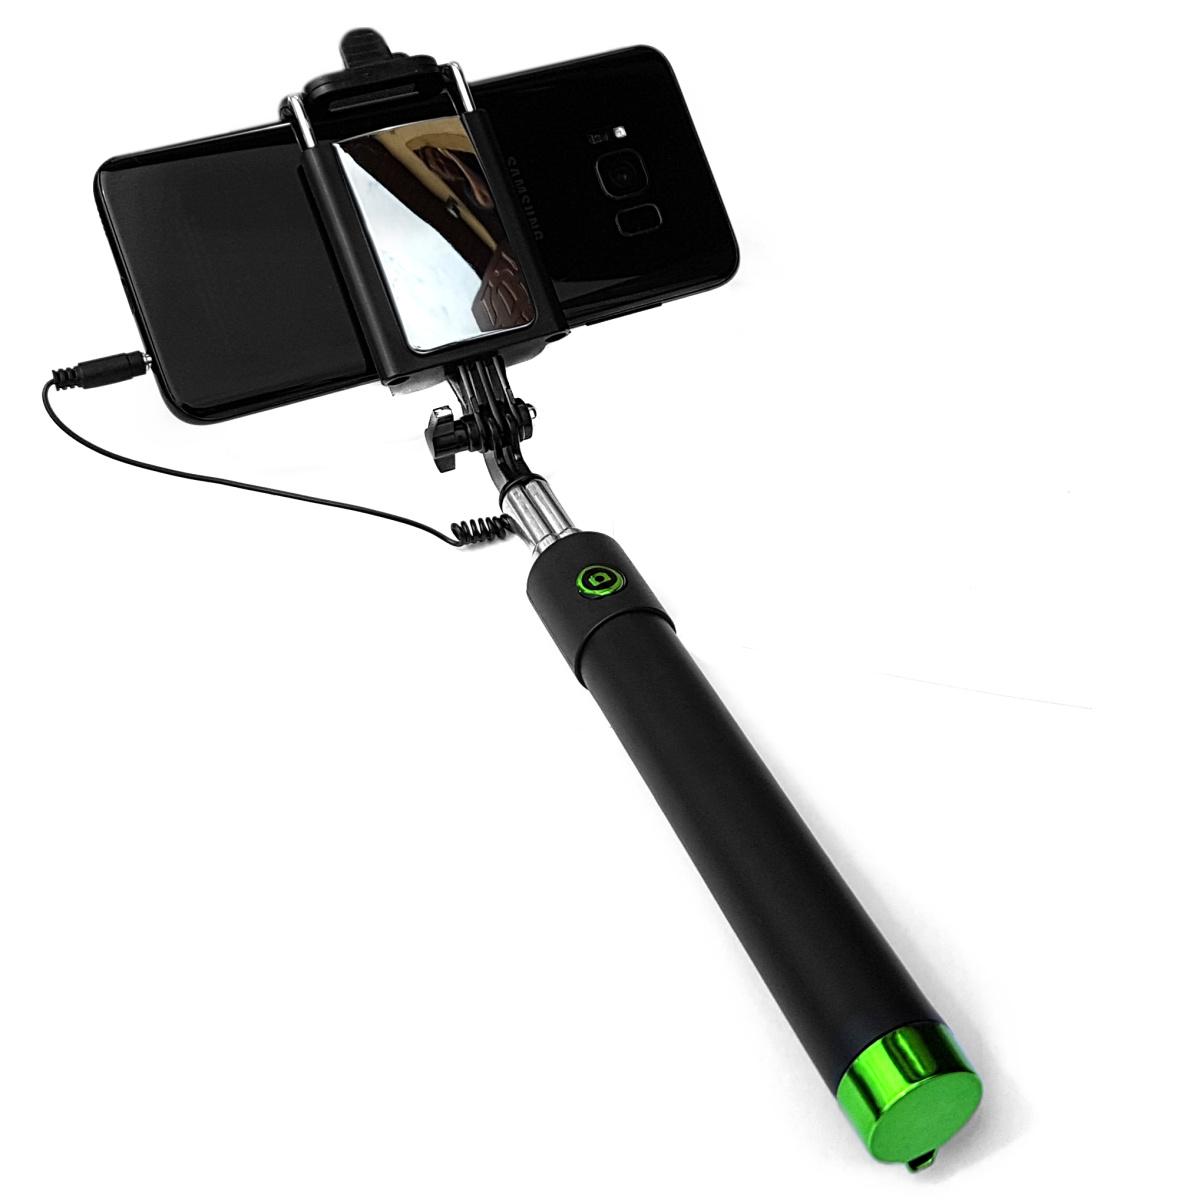 Kijek Selfiestick Microsoft Lumia 640 LTE Dual SIM